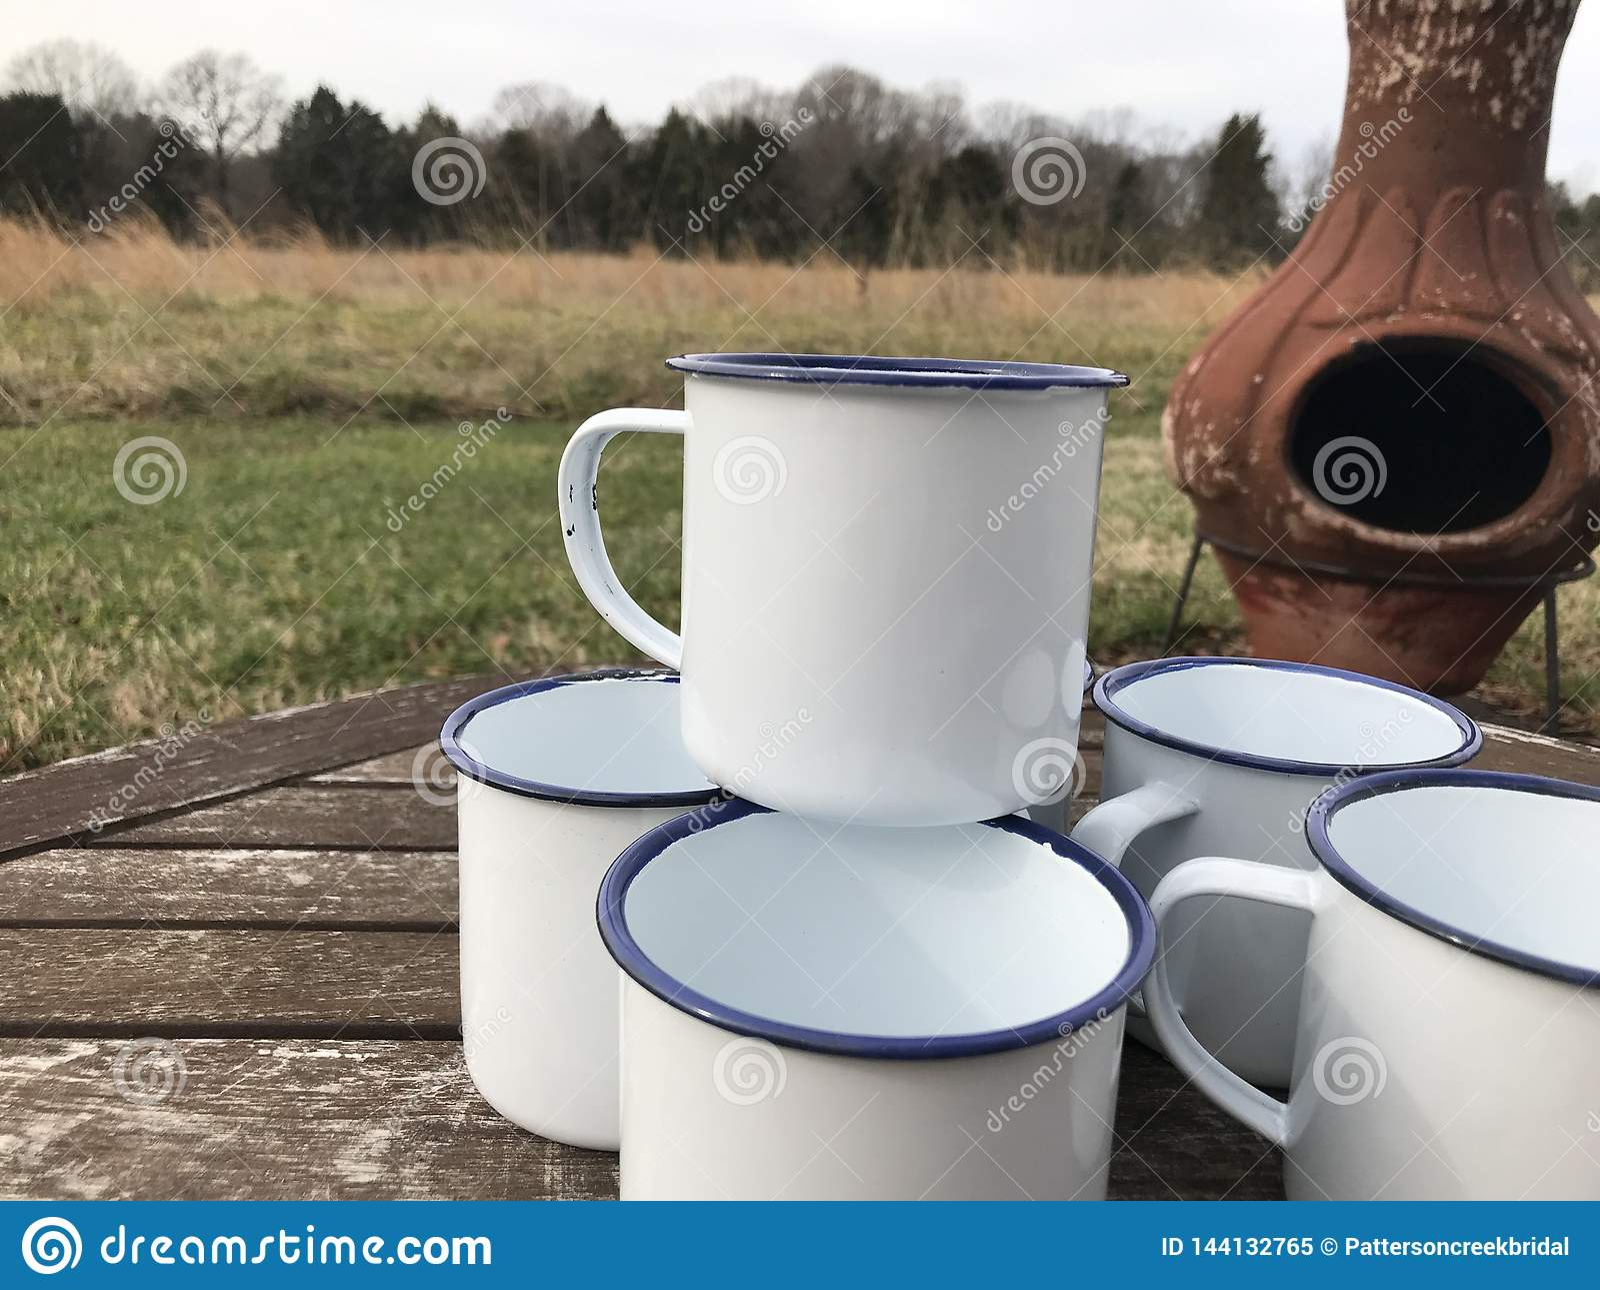 Enamelware Camping Cups Mugs Mock Up Stock Image Image Of Design Coffee 144132765